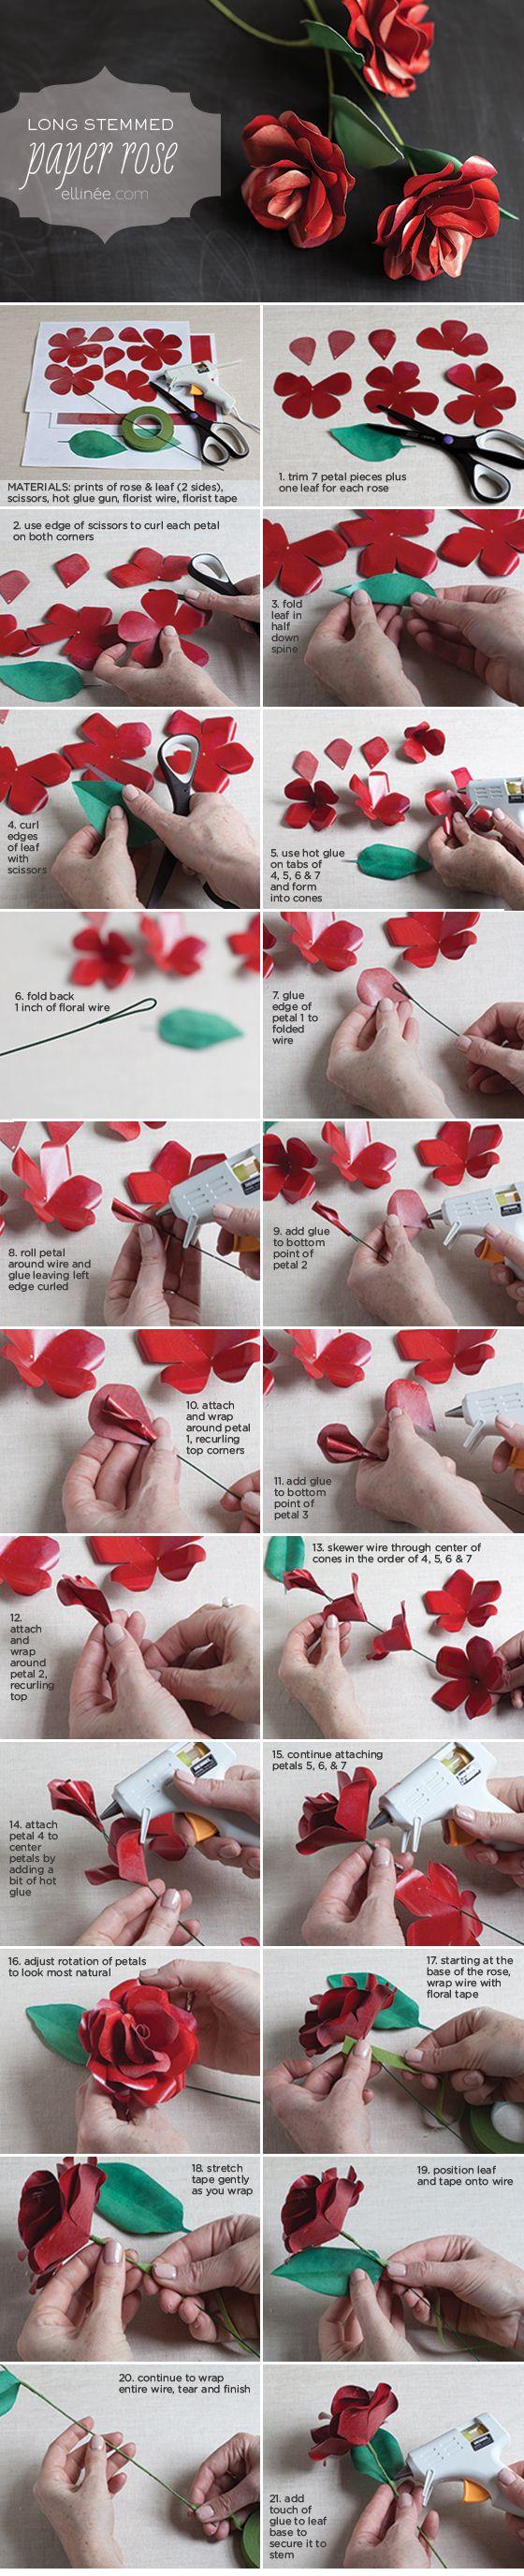 Long Stemmed Paper Rose Tutorial, DIY - flowers garland,Cool Flower Crafts , Paper Crafts for Teens , paper, craft, flower,wrap, gift, decor,blumen,basteln,bastelvorlage,tutorial diy, spring kids crafts, paper flowers